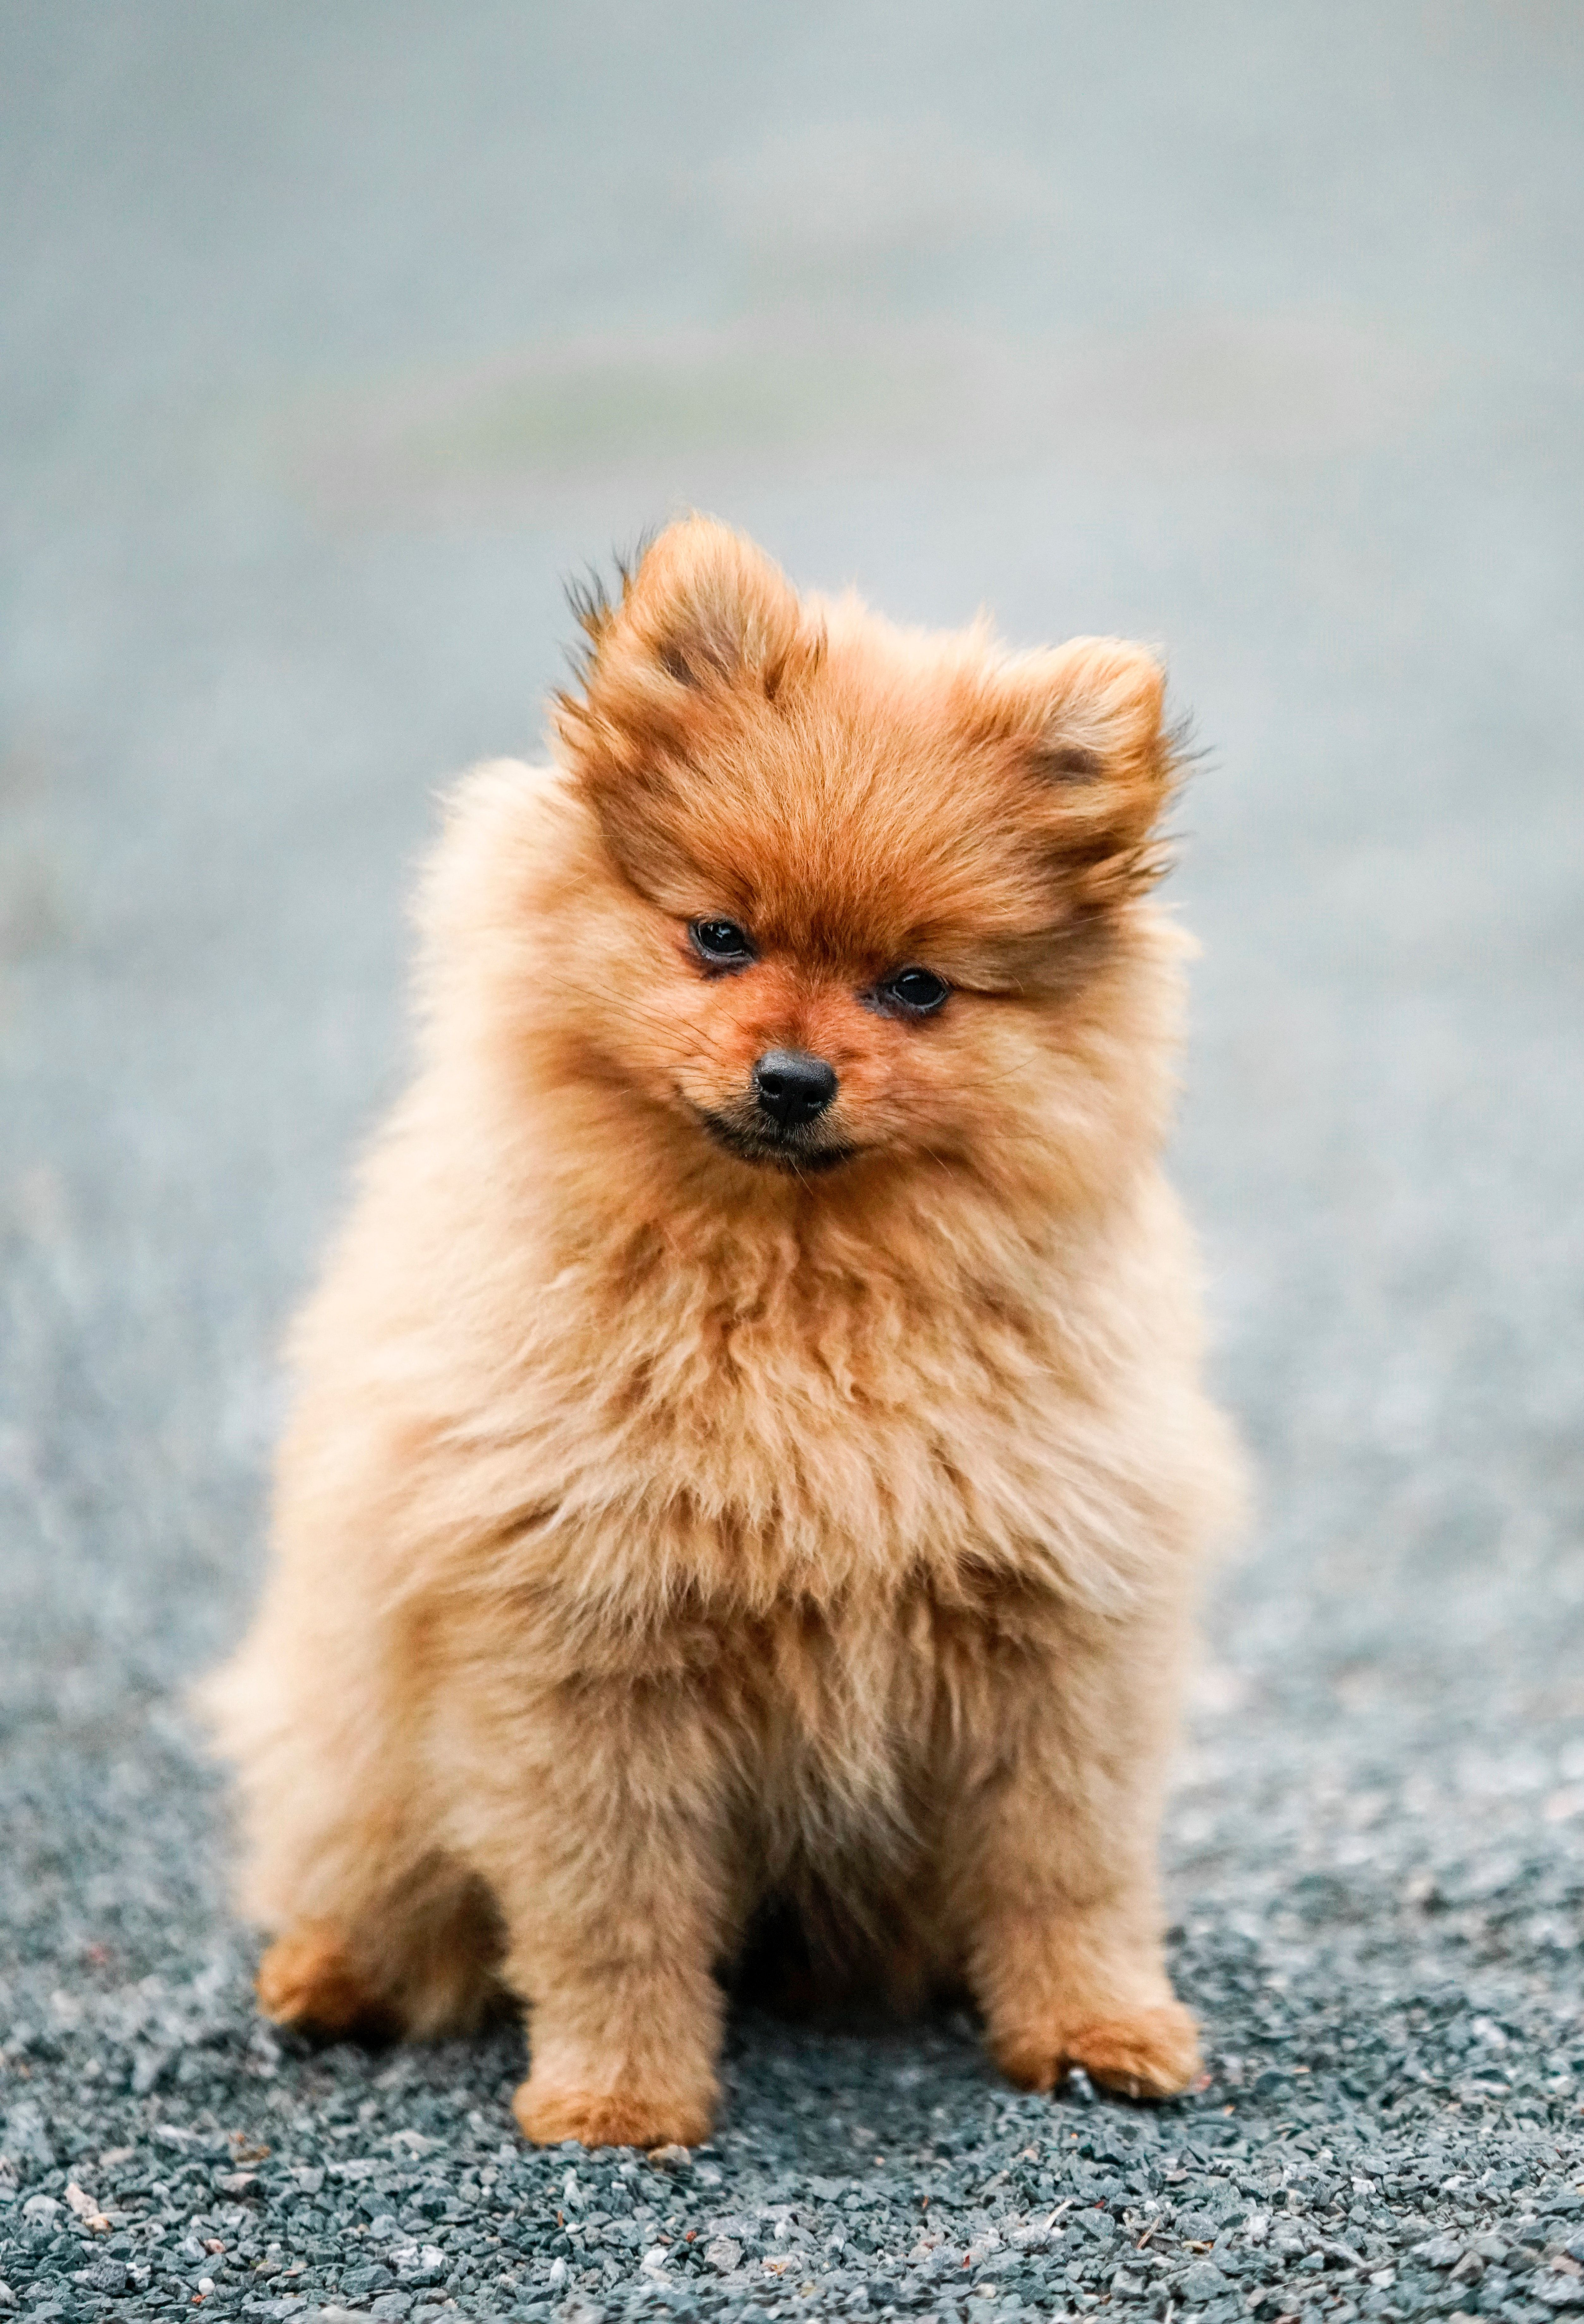 Aimez Vous Dog Vous Pouvez Acheter Un T Shirt Avec Ce Lien Https Teespring Com Fr Stores Love Dog 24 In 2020 Toy Dog Breeds Dog Modeling Small Dog Breeds